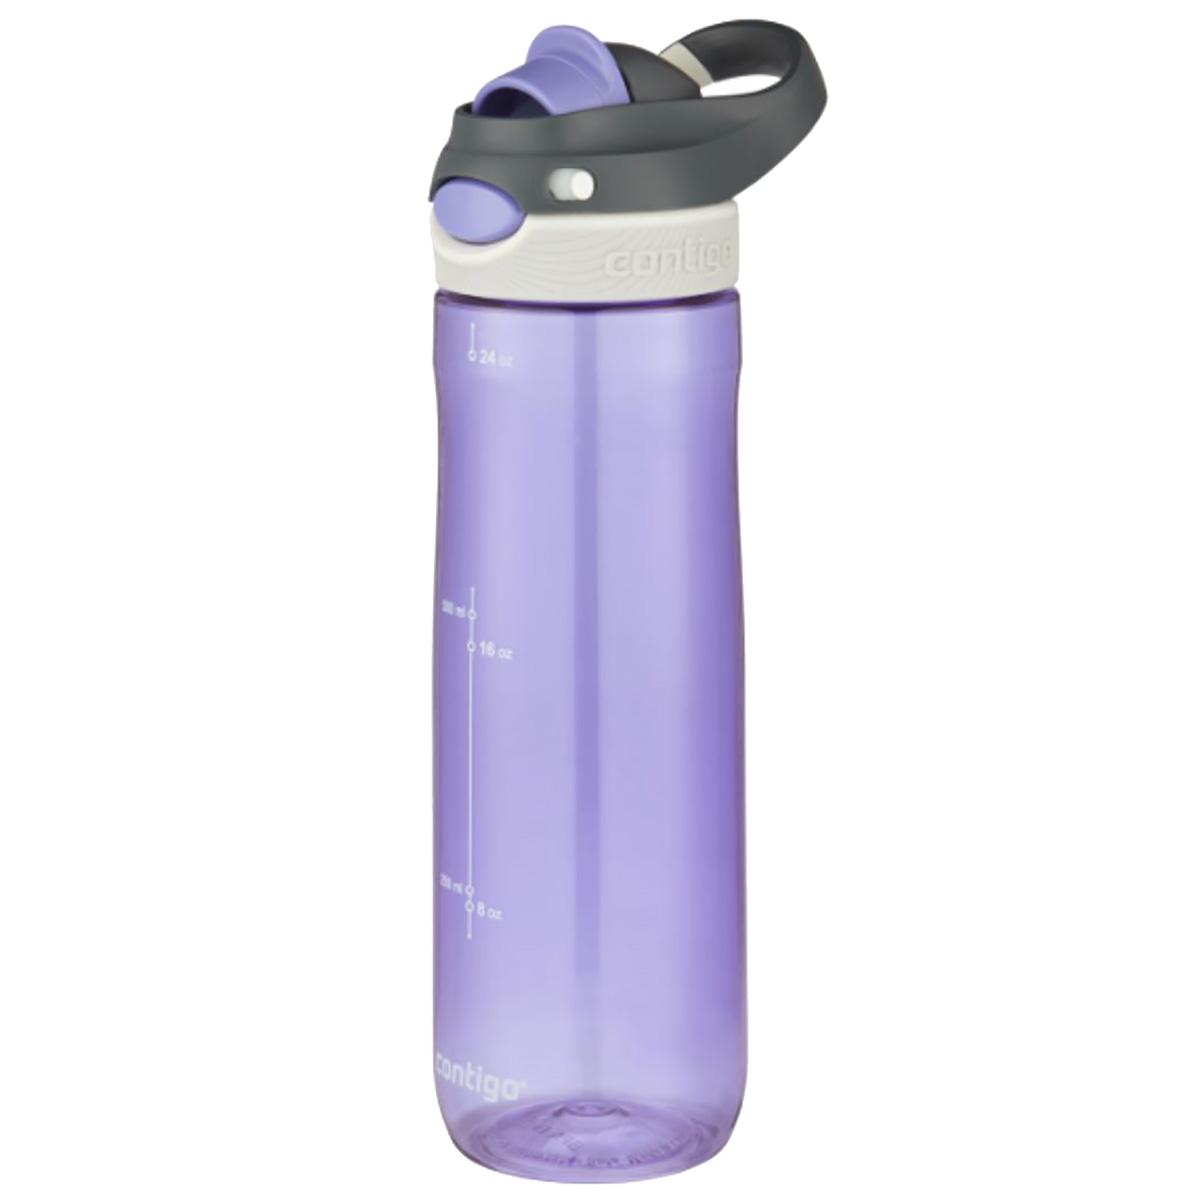 Contigo-24-oz-Chug-Autospout-Leak-Proof-Water-Bottle miniatuur 4